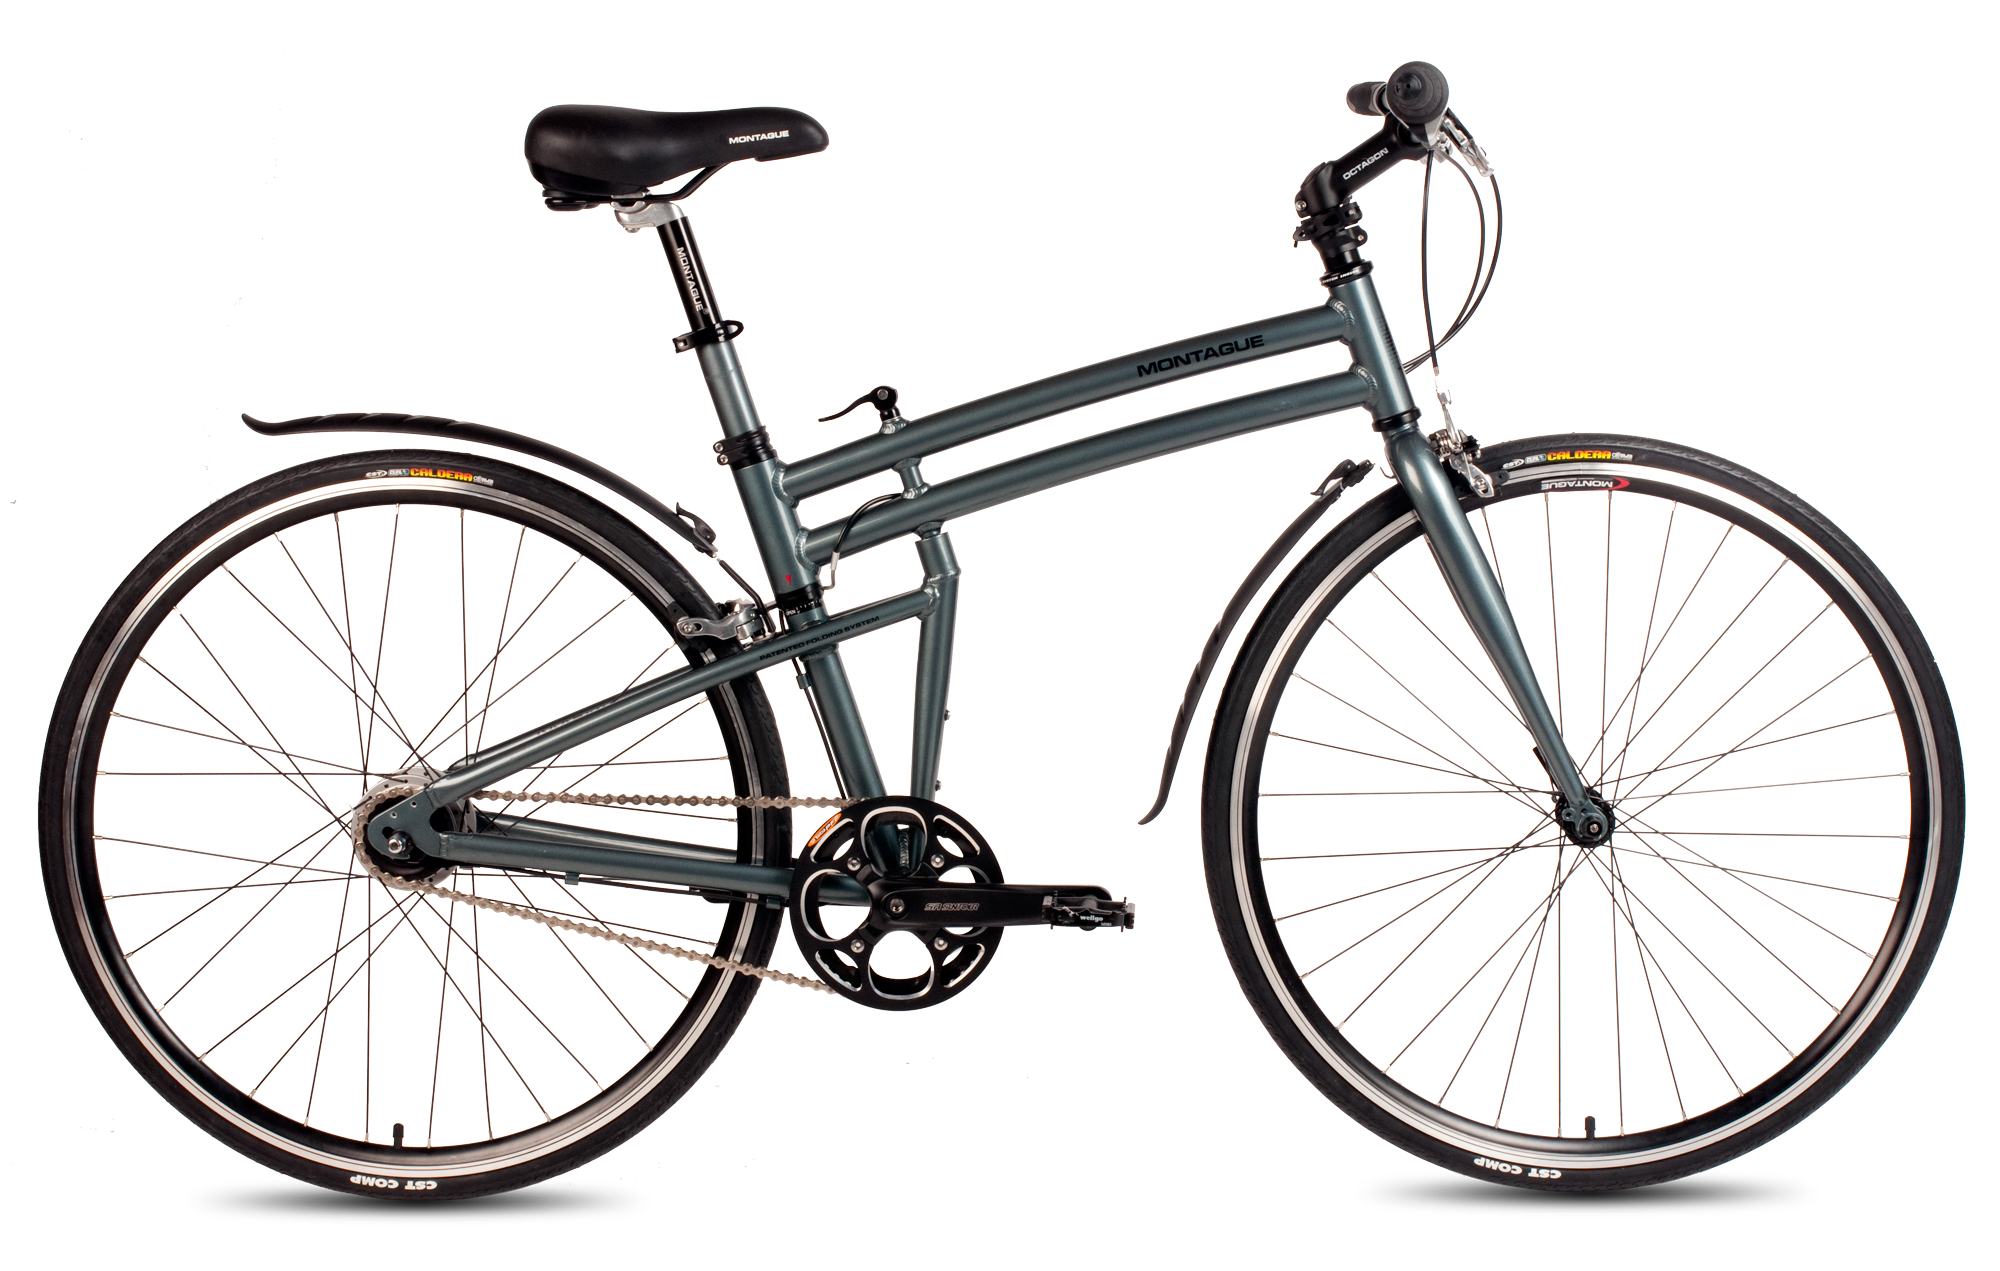 Boston 8 Pavement Folding Bike